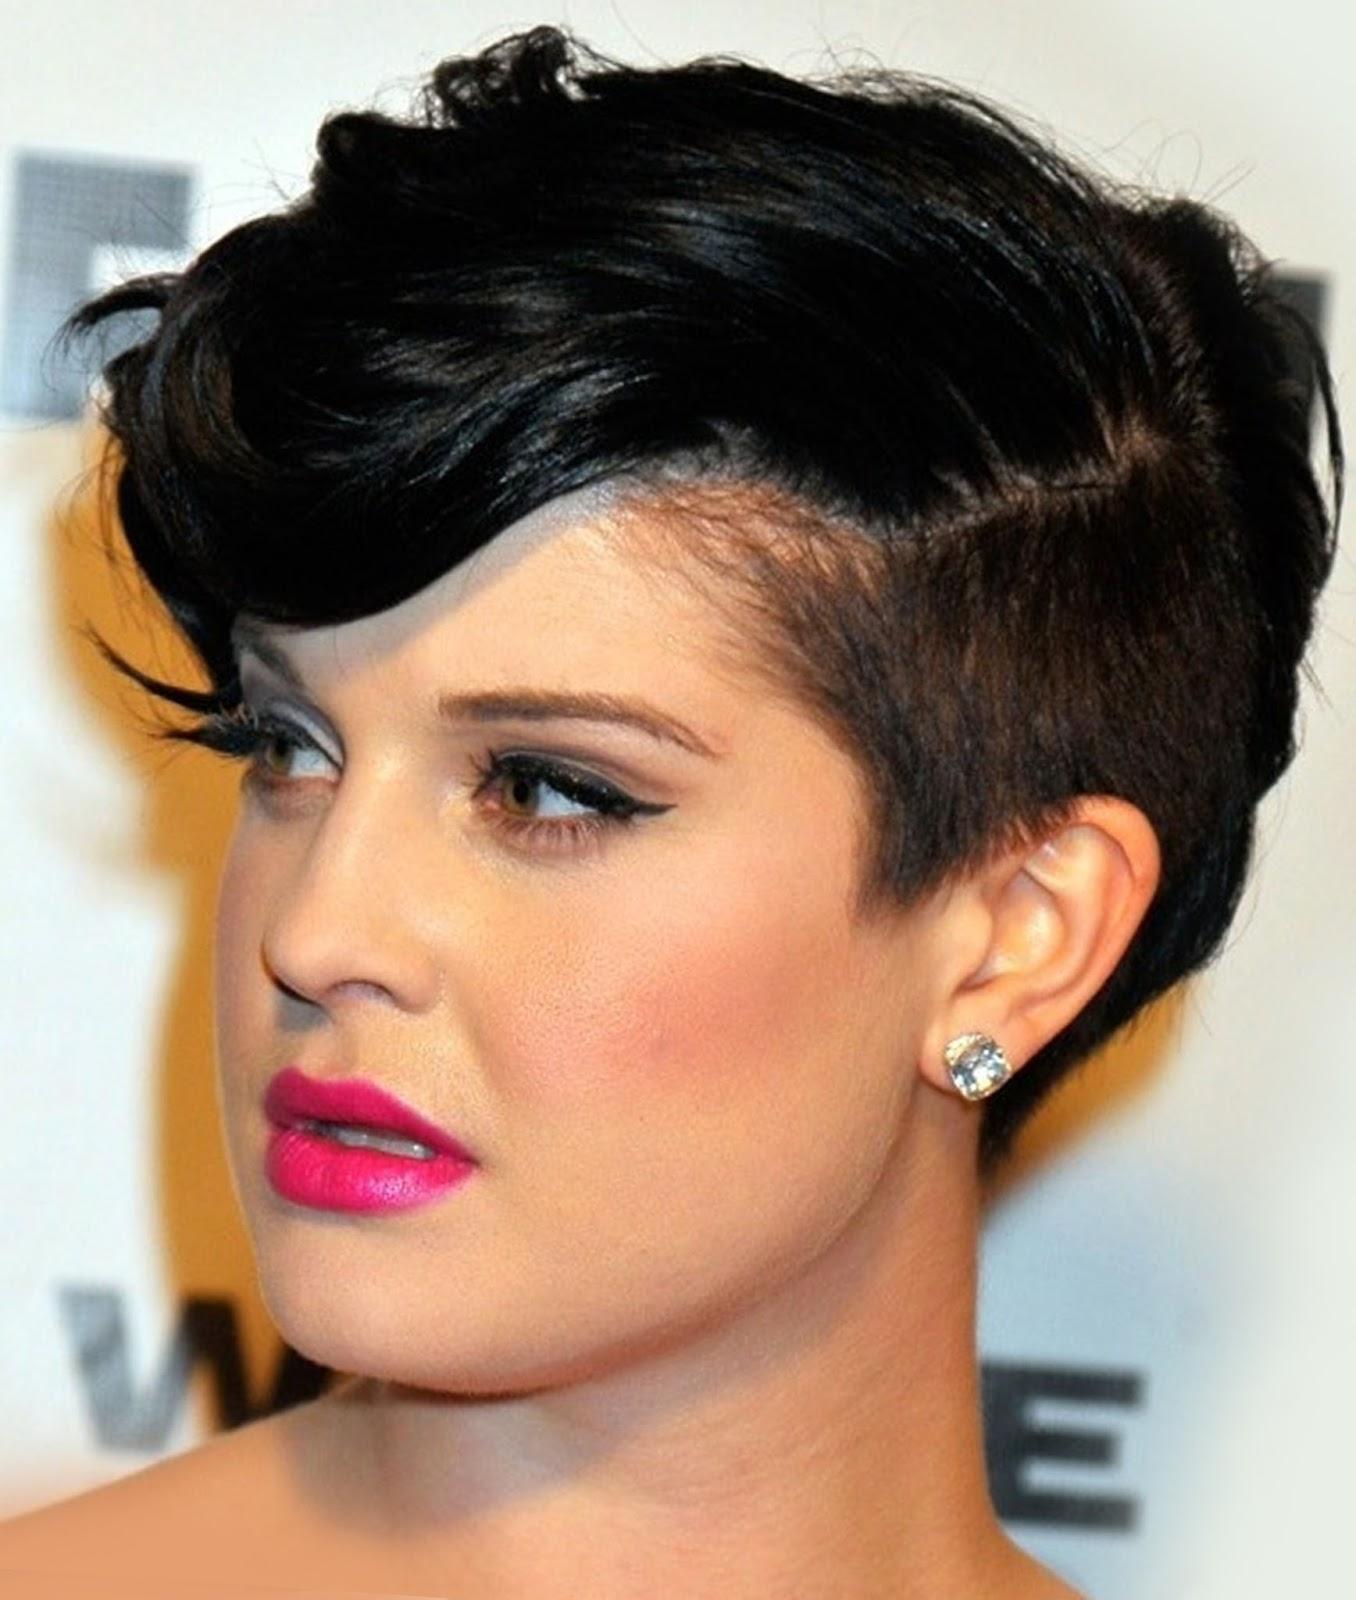 Mohawk Hairstyles For Women: Modern Look!